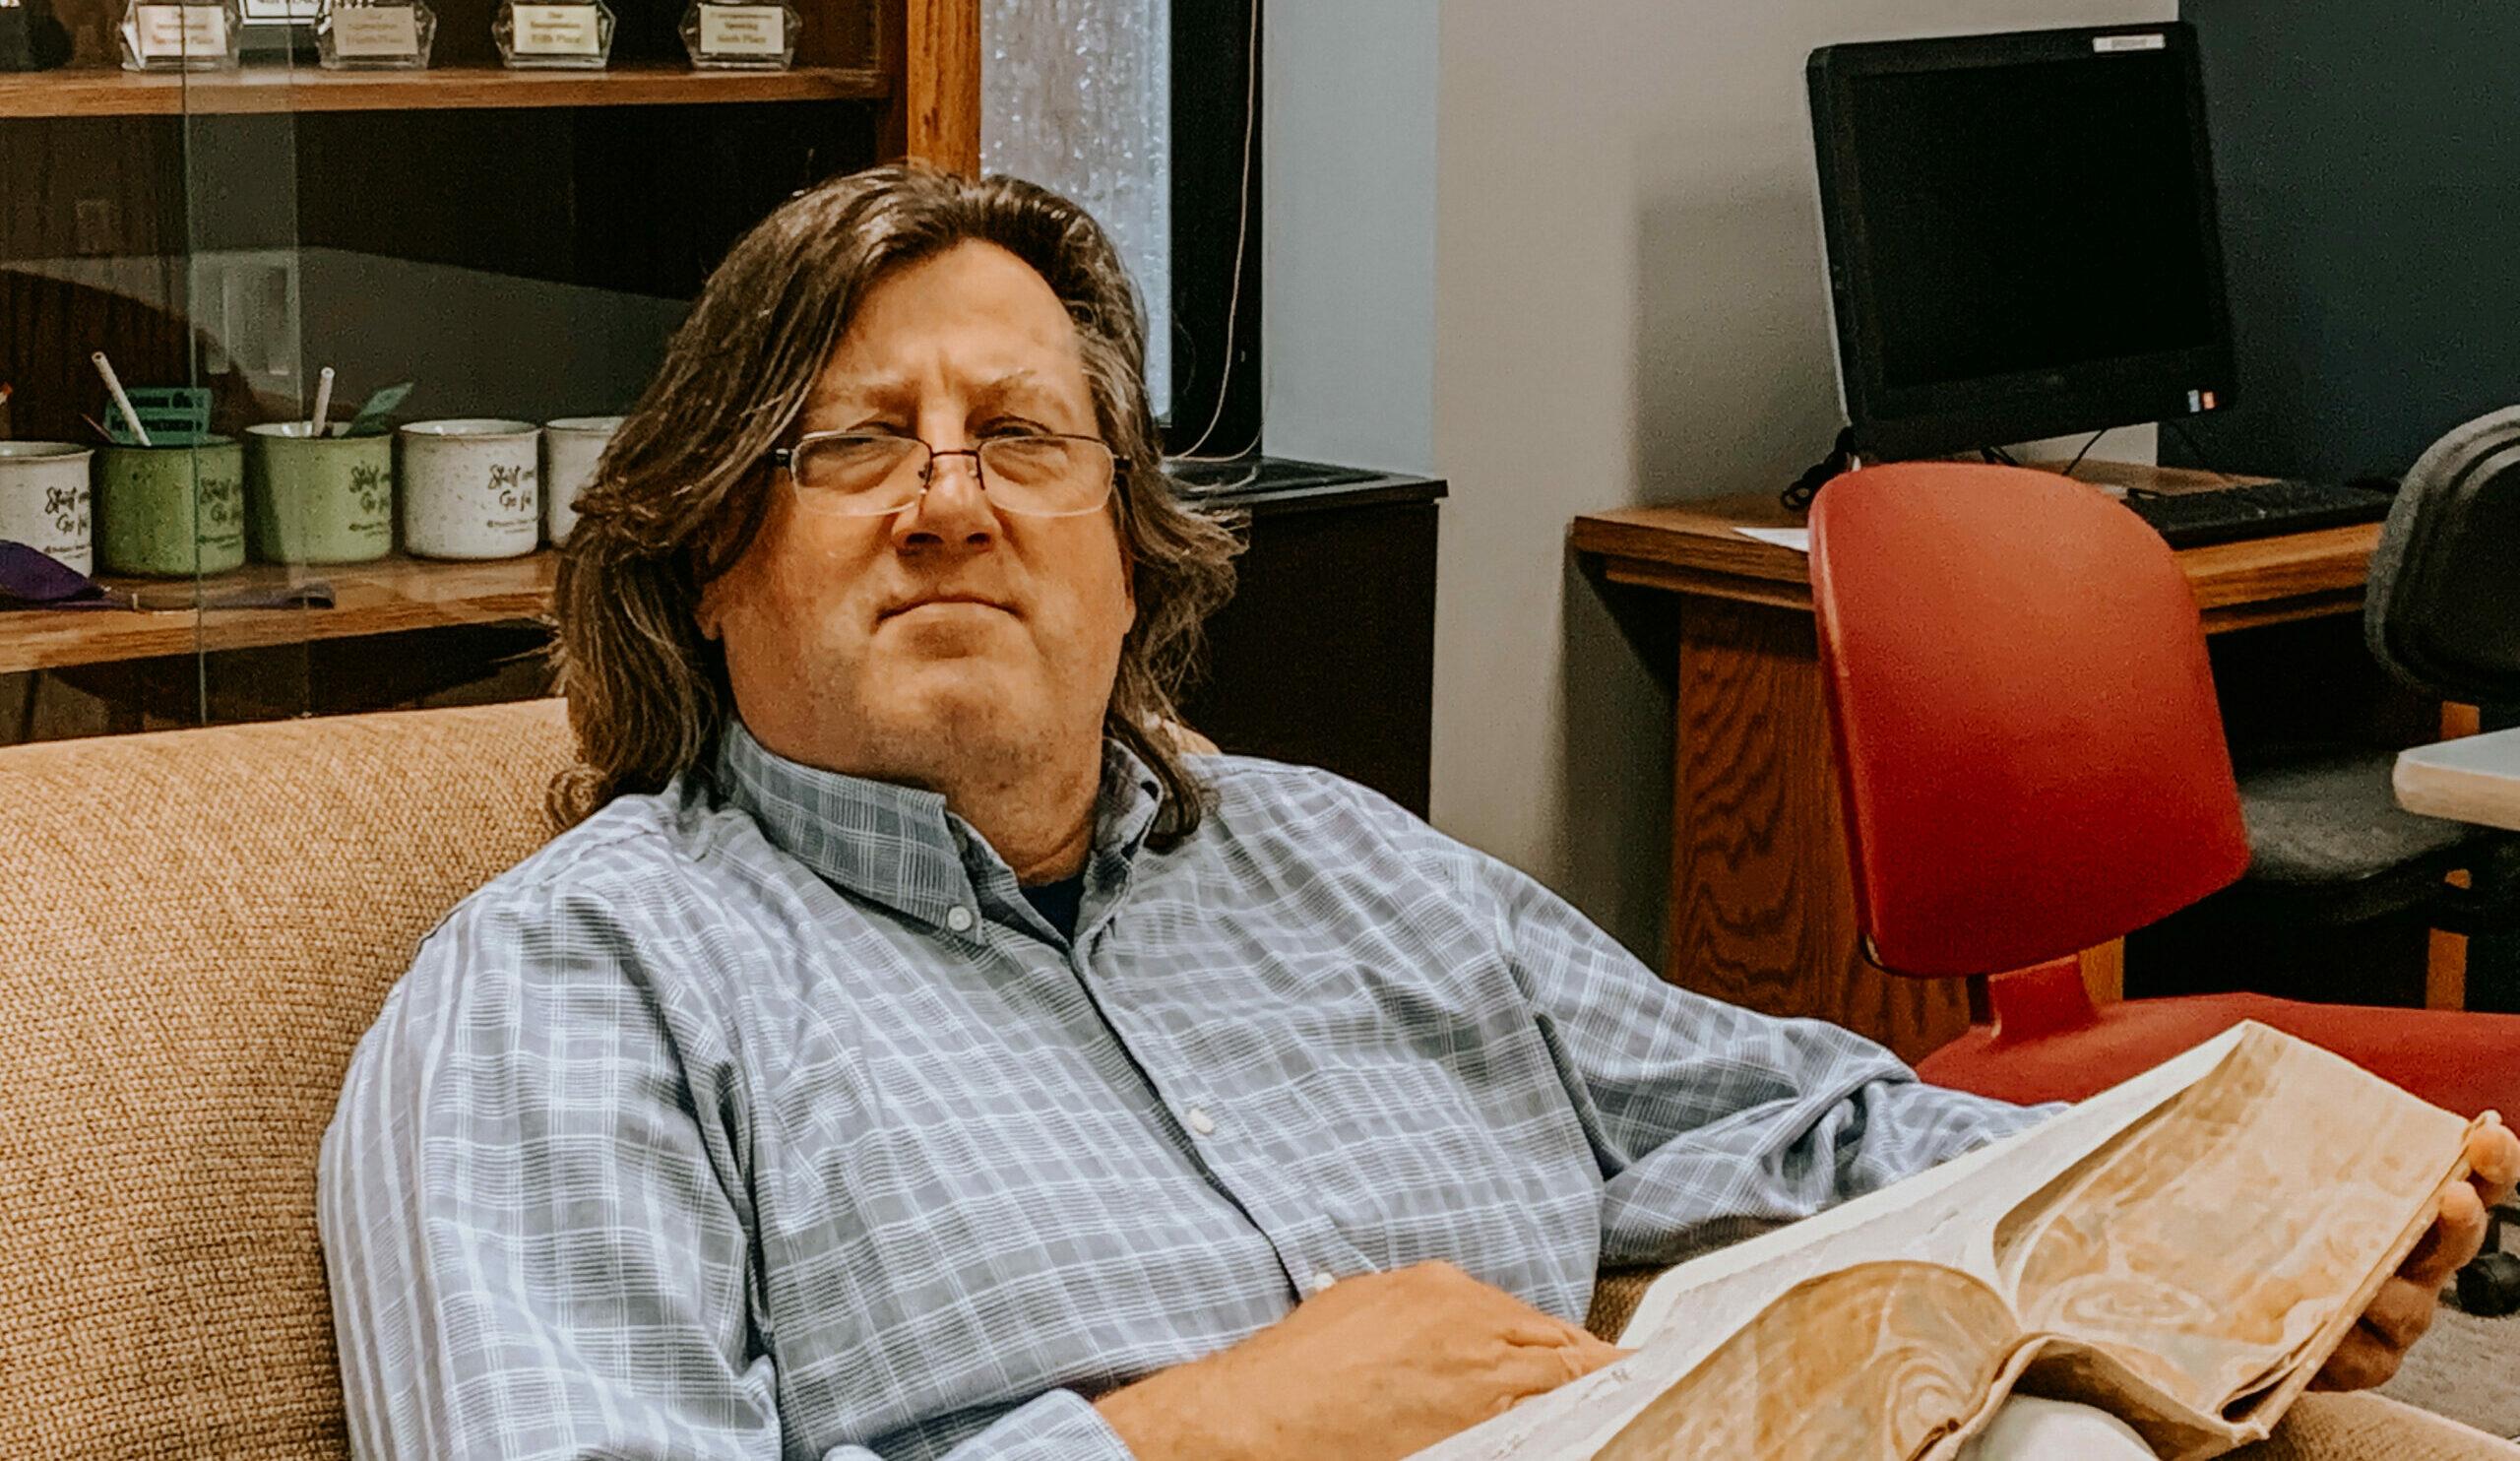 Henry Krusiewicz, Professor of English | Faces of Midland: Employee Edition | Midland University